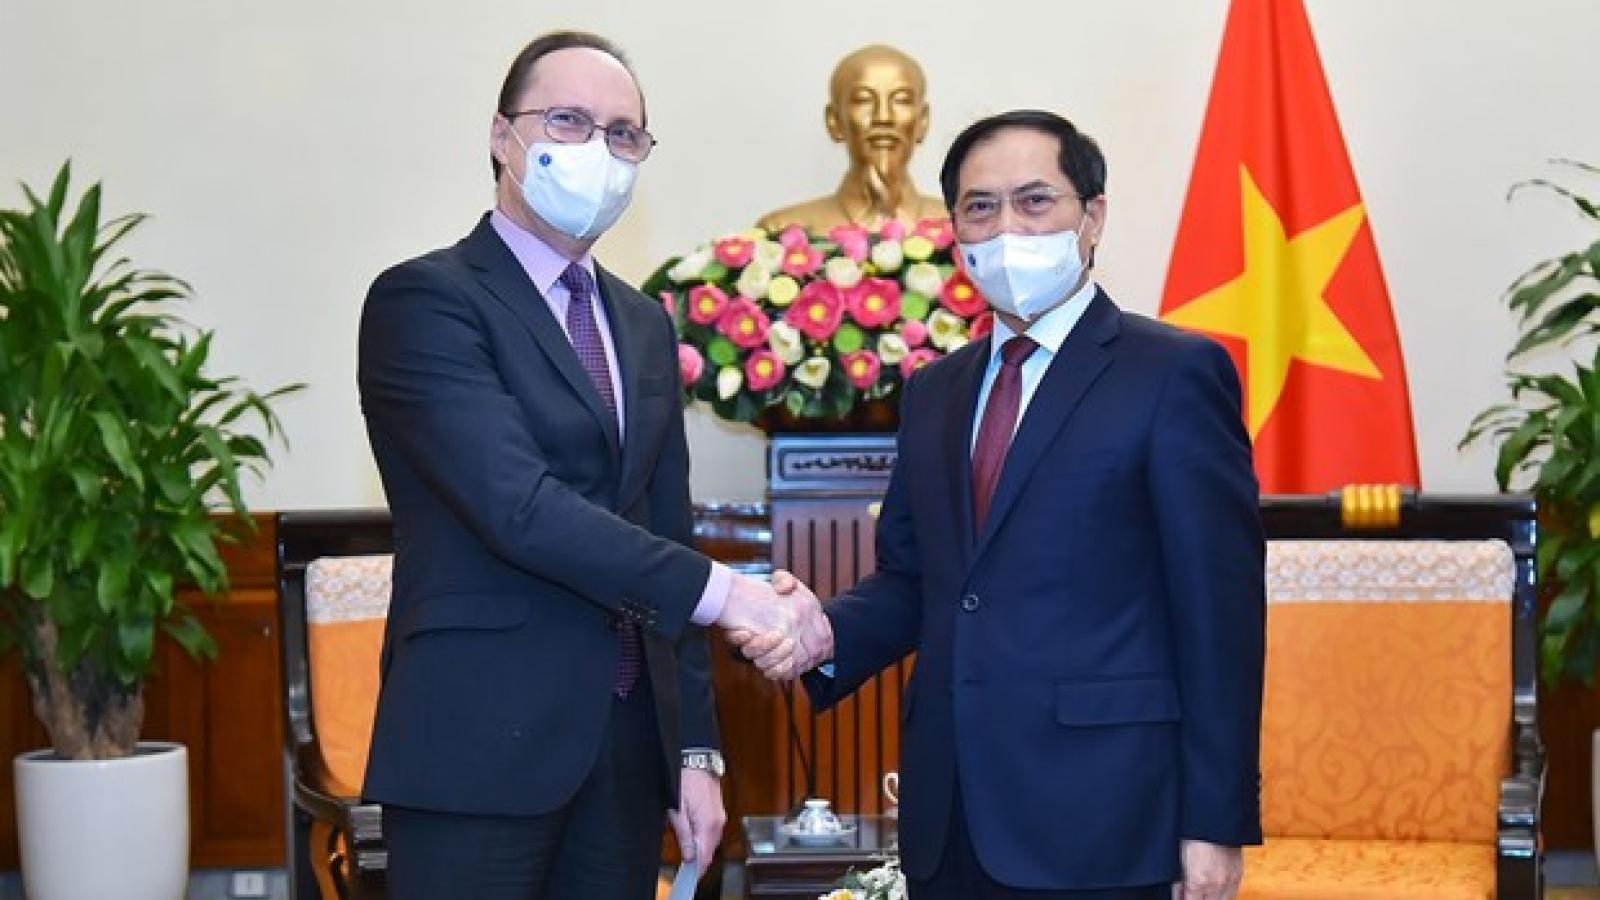 Vietnam treasures comprehensive strategic partnership with Russia: FM